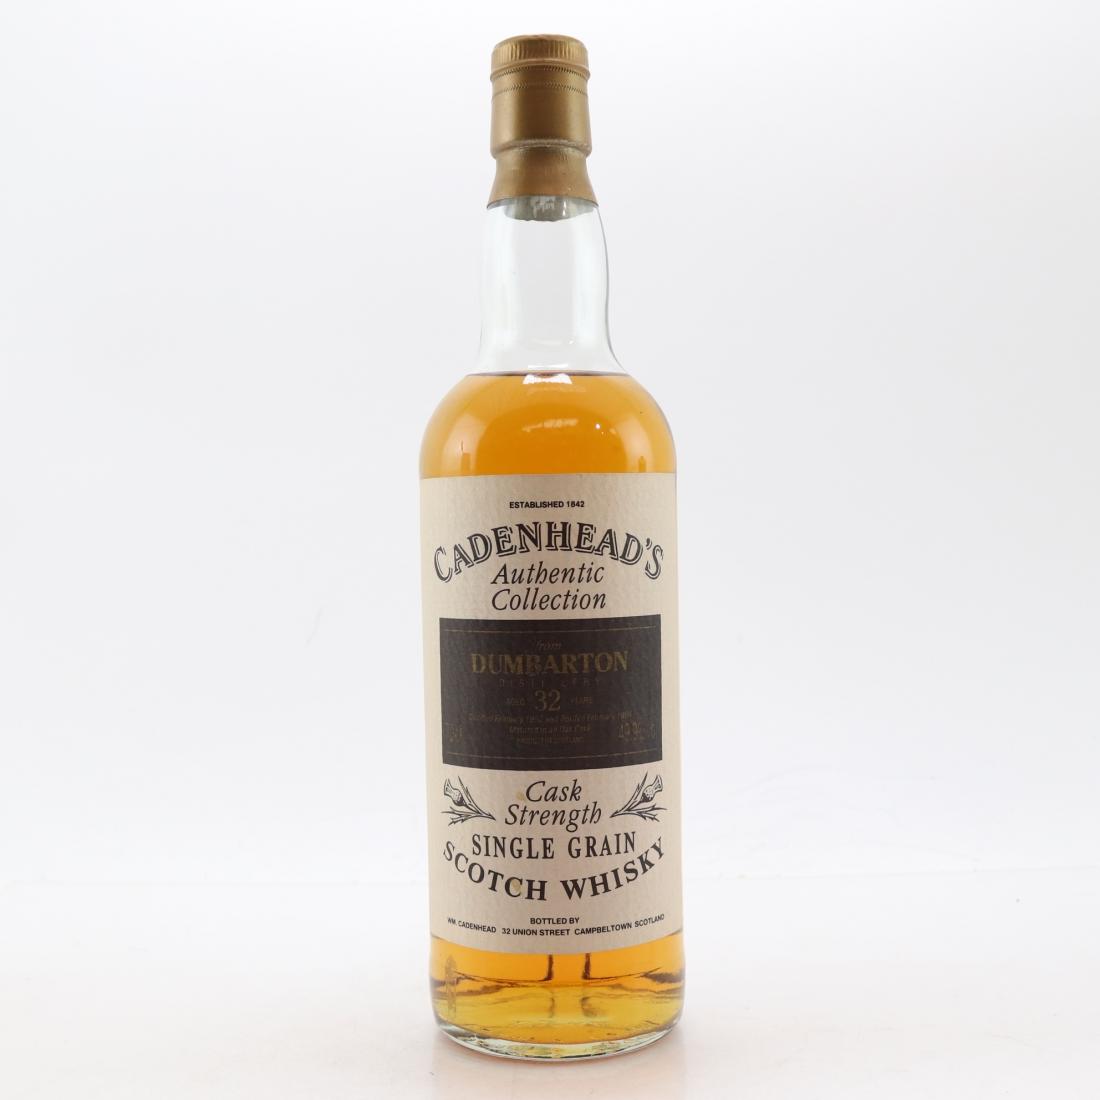 Dumbarton 1962 Cadenhead's 32 Year Old